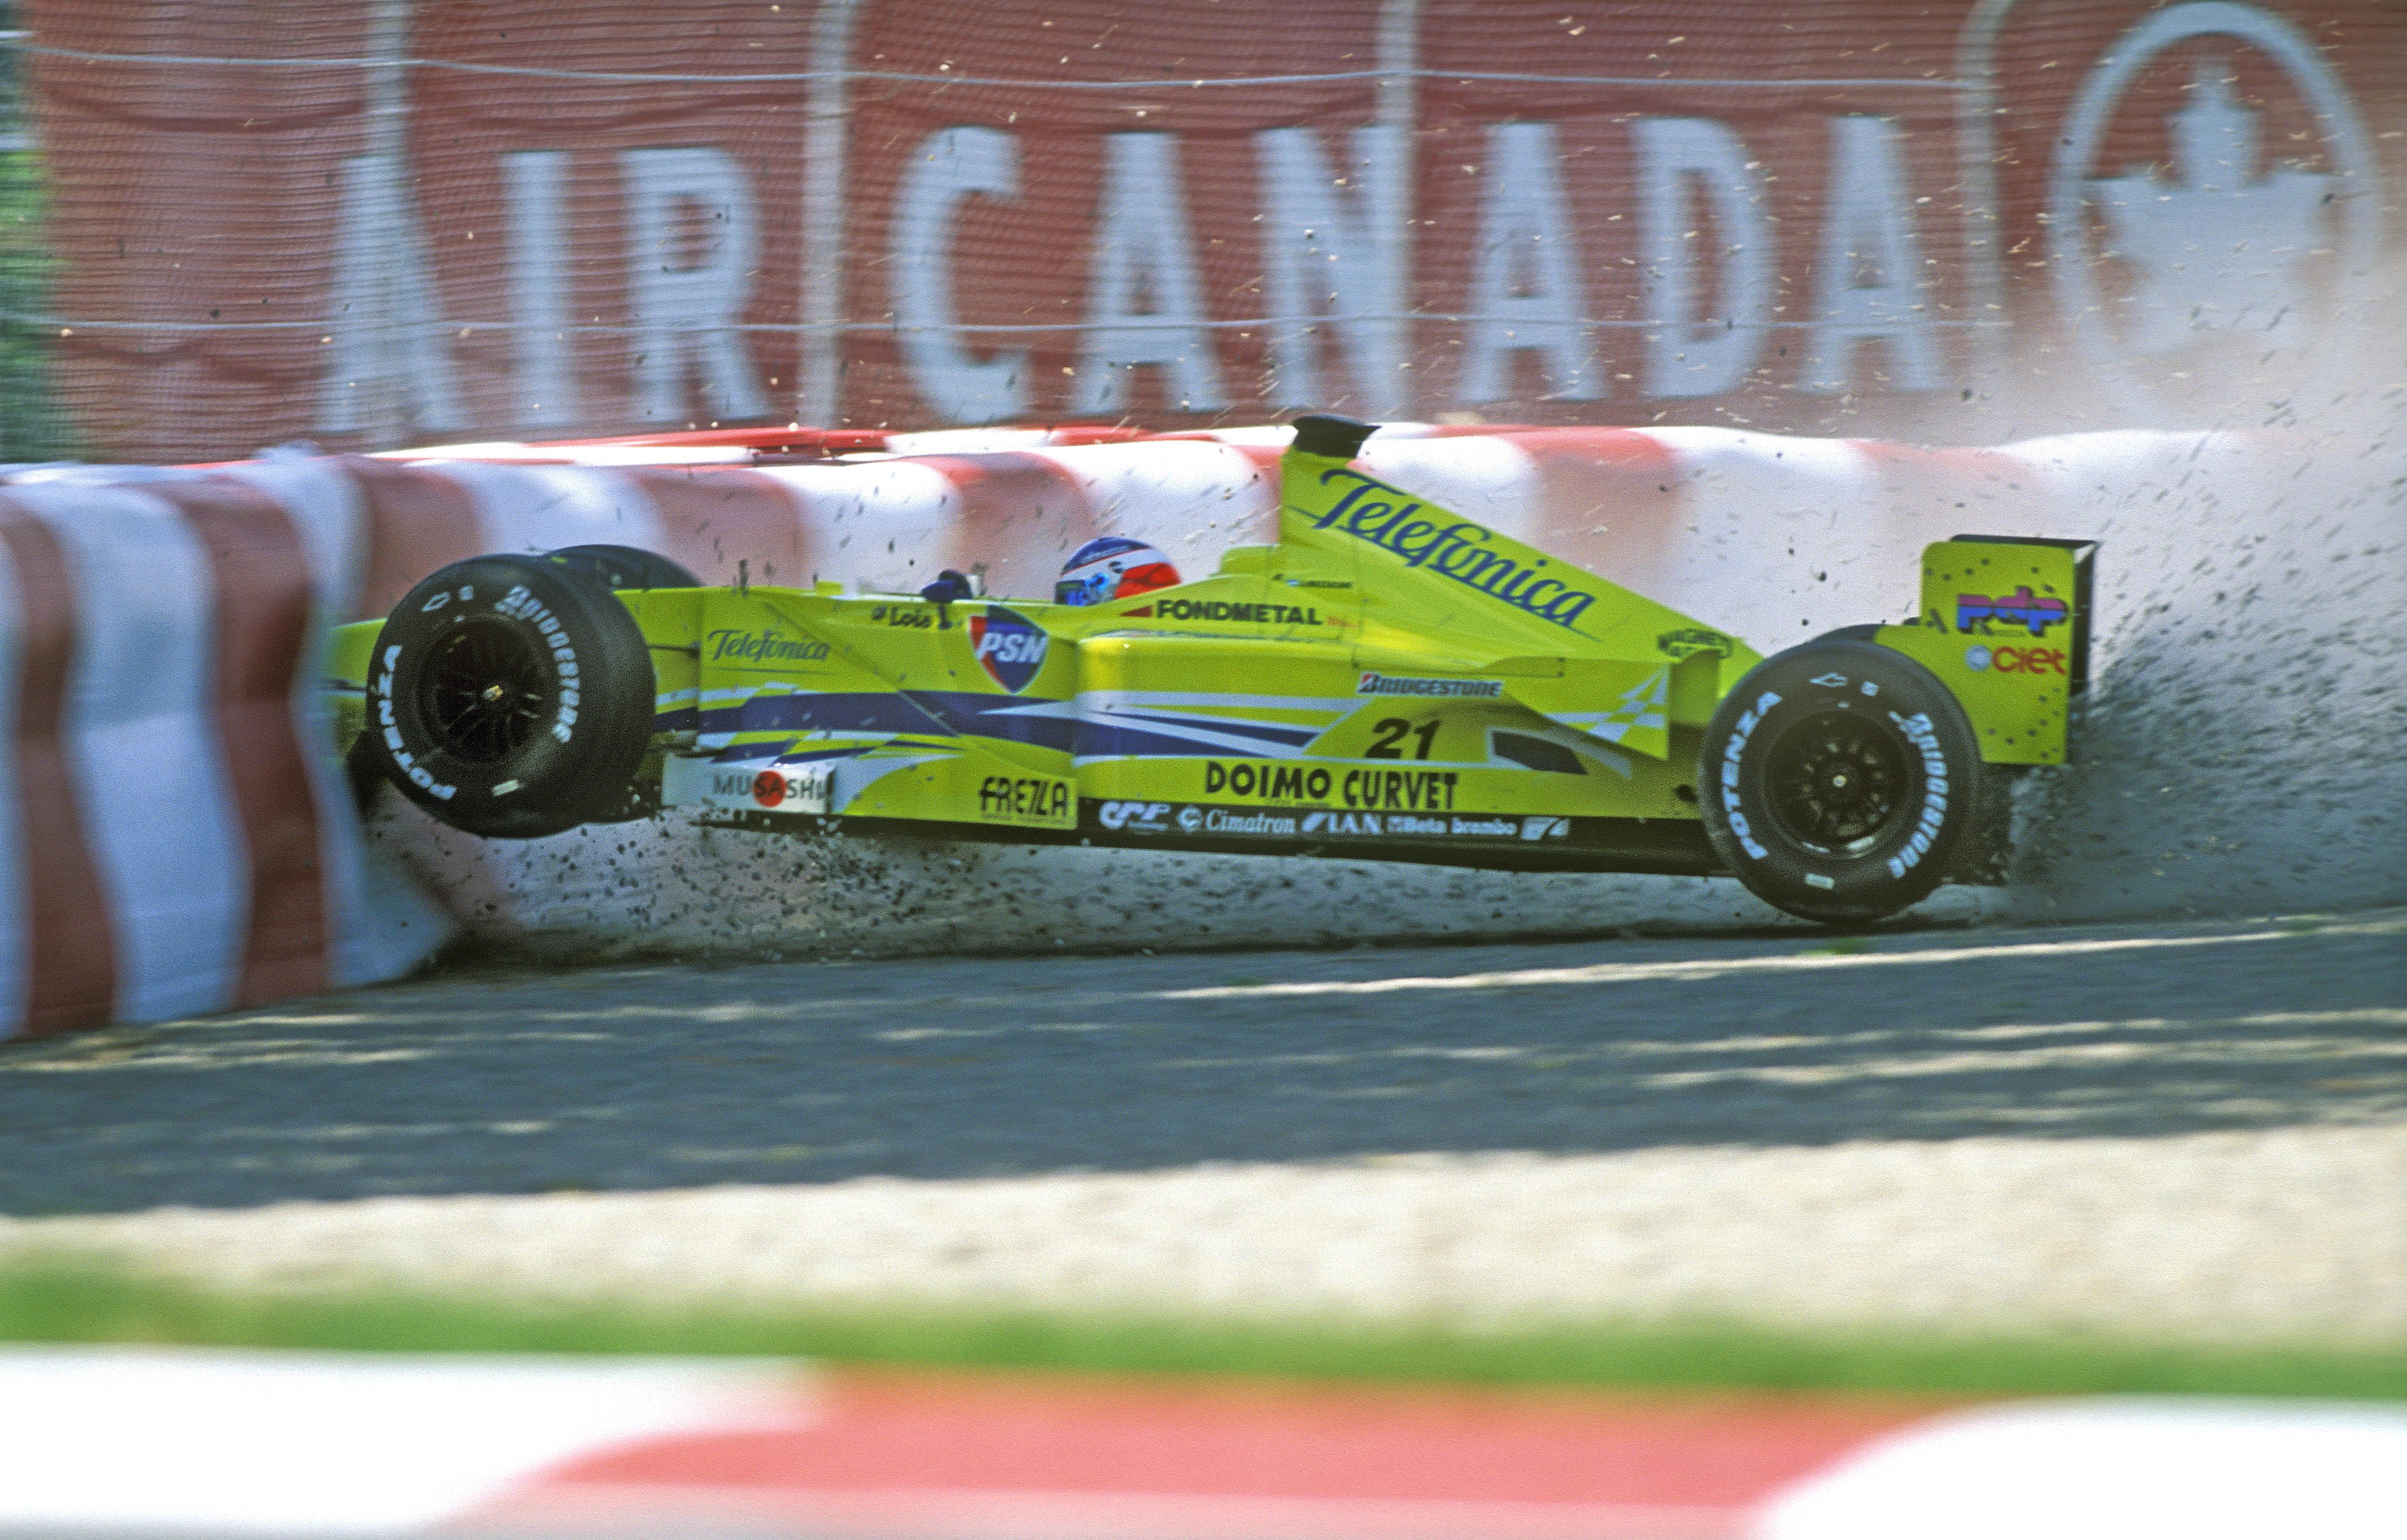 Gaston Mazzacane Minardi F1 crash 2000